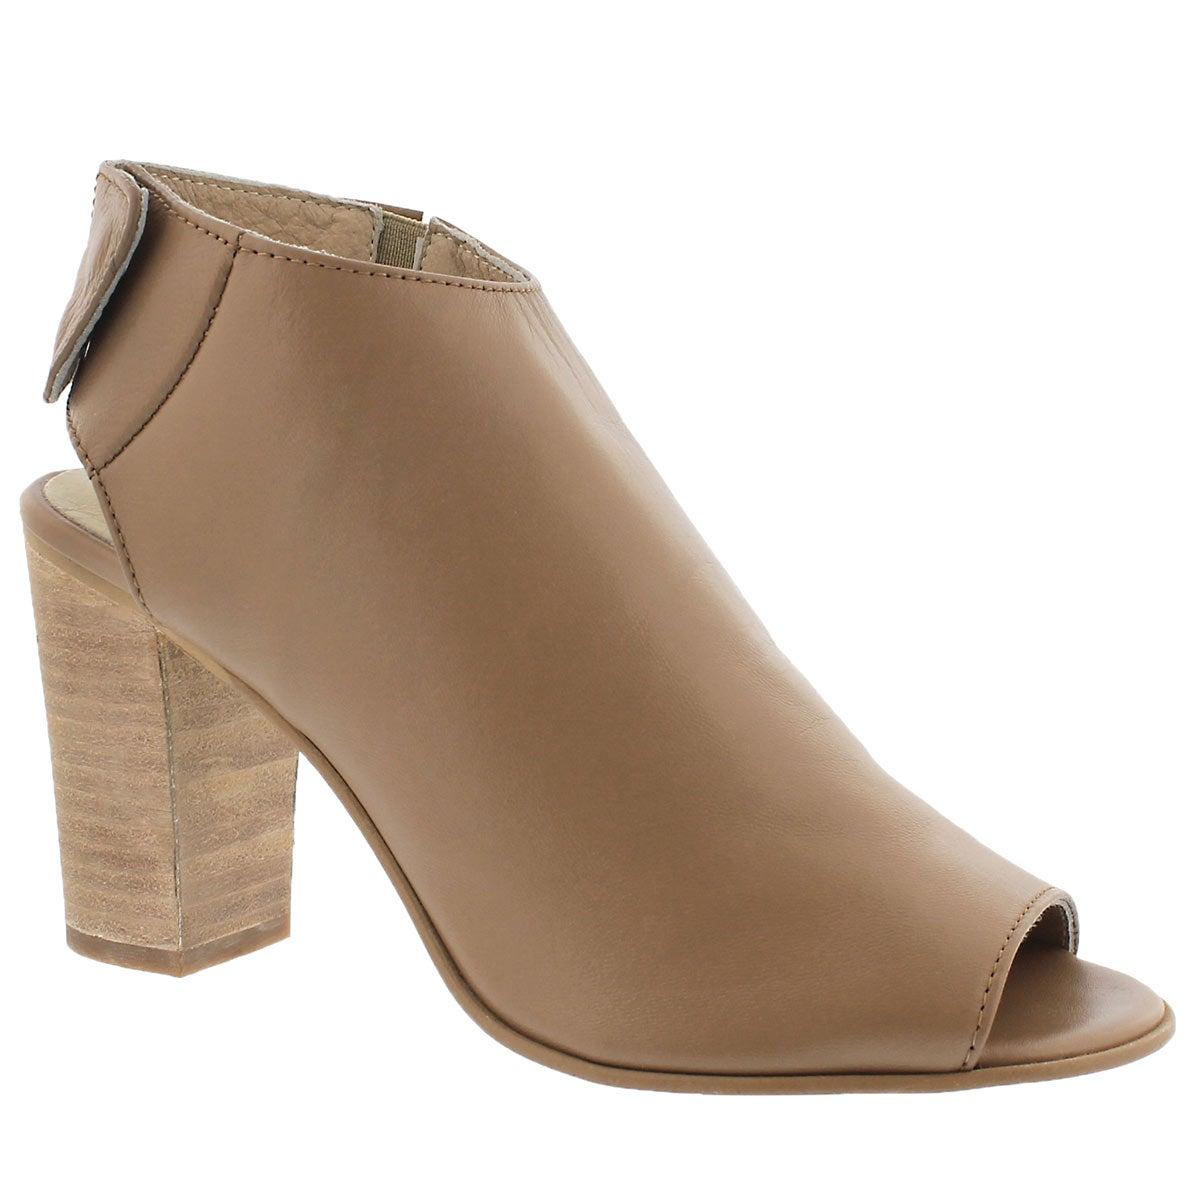 Women's NONSTOP natural peep toe dress sandals